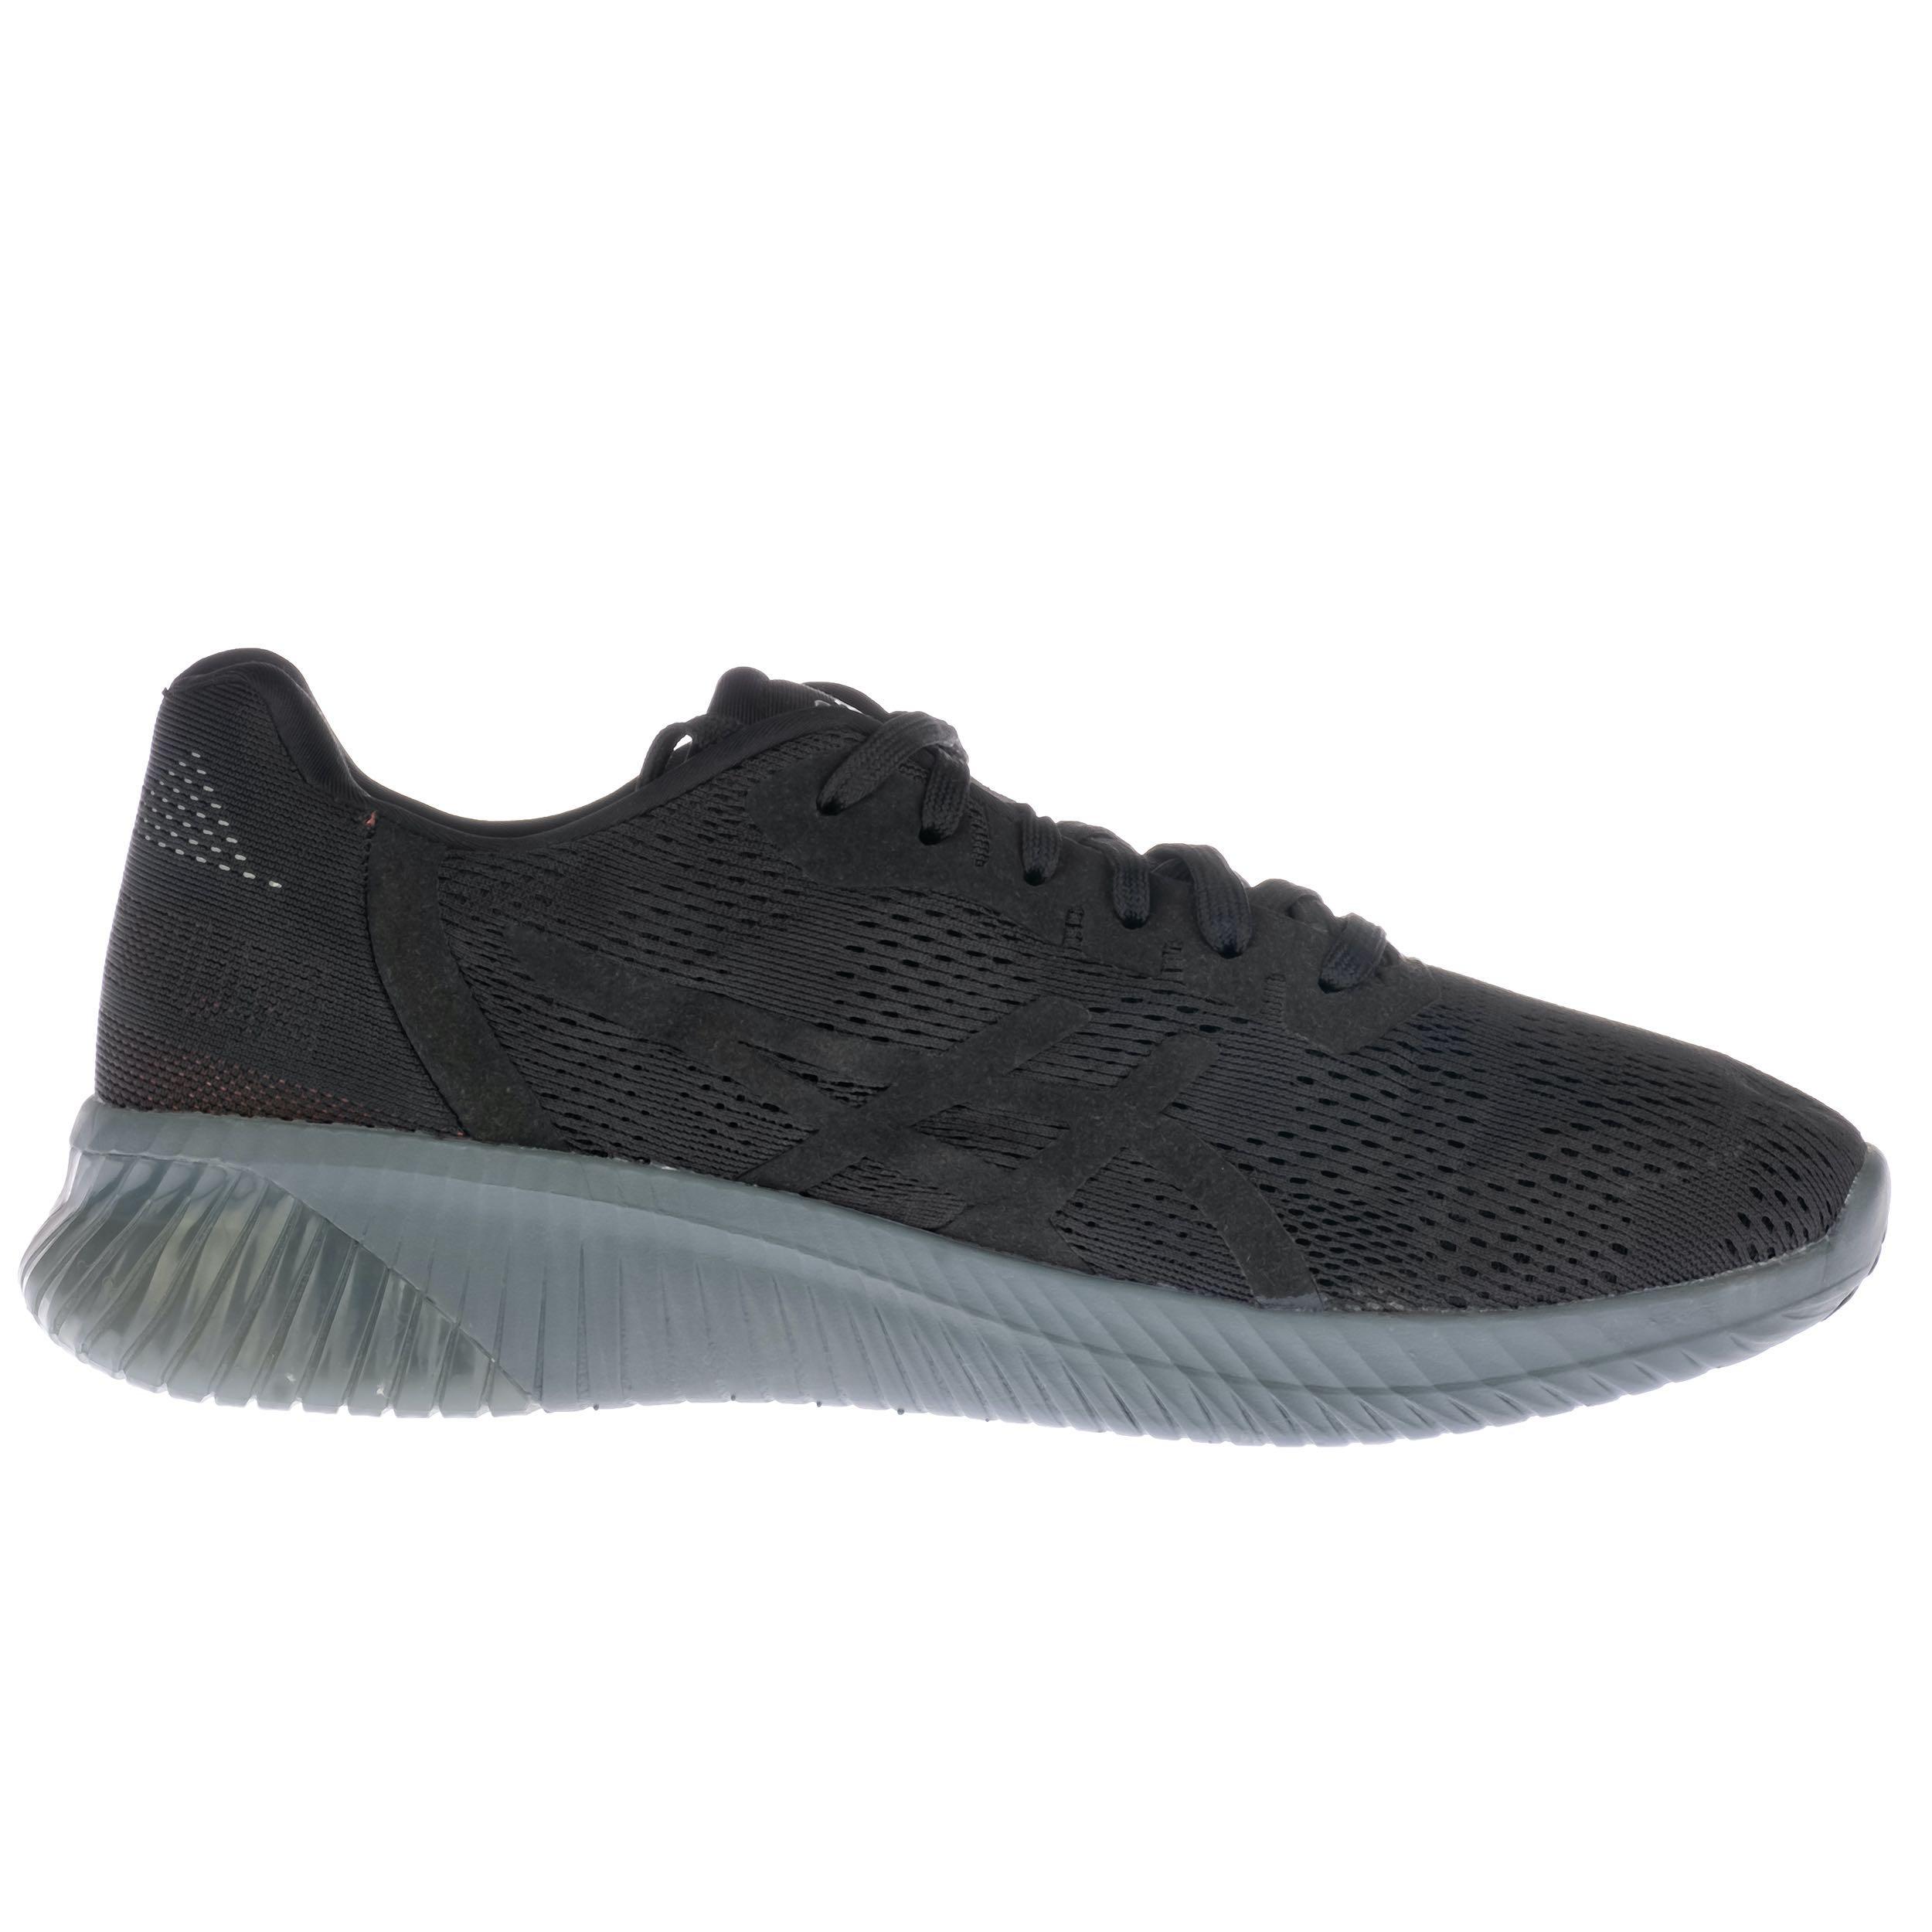 خرید                      کفش  پیاده روی مردانه کد D18